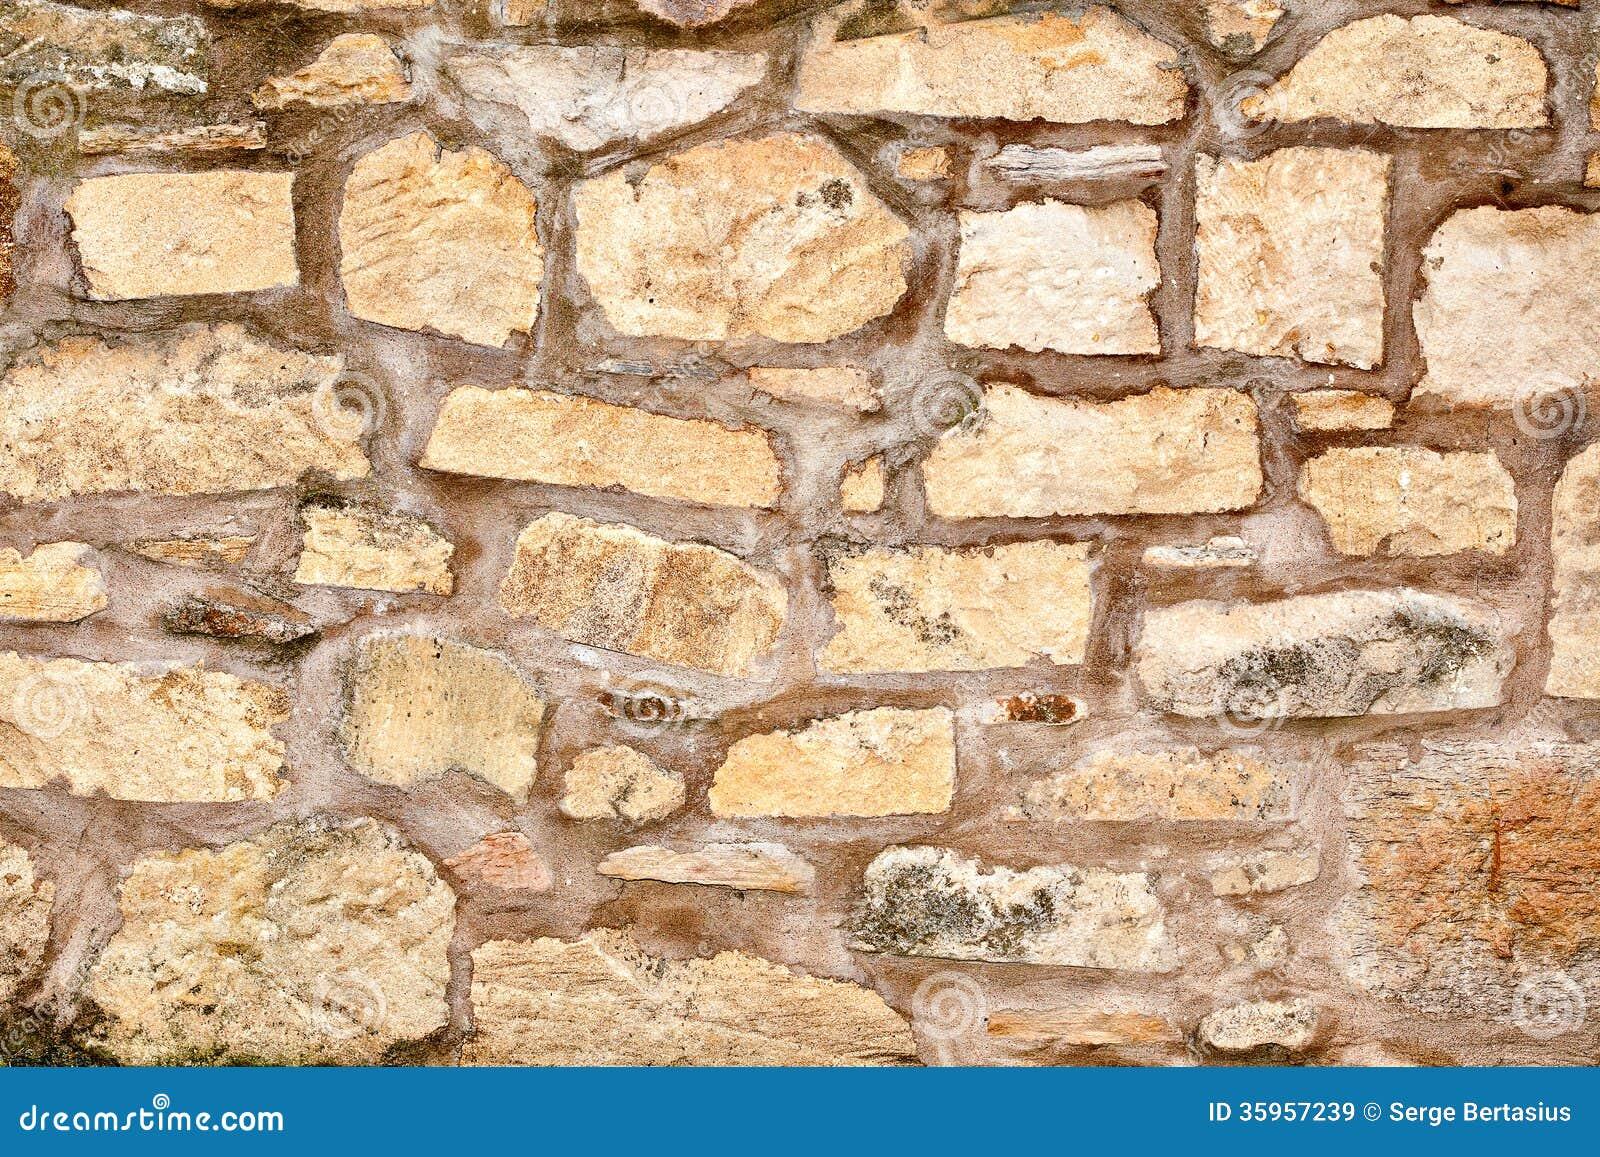 Old Brick Wall Decor : Old brick wall texture royalty free stock images image